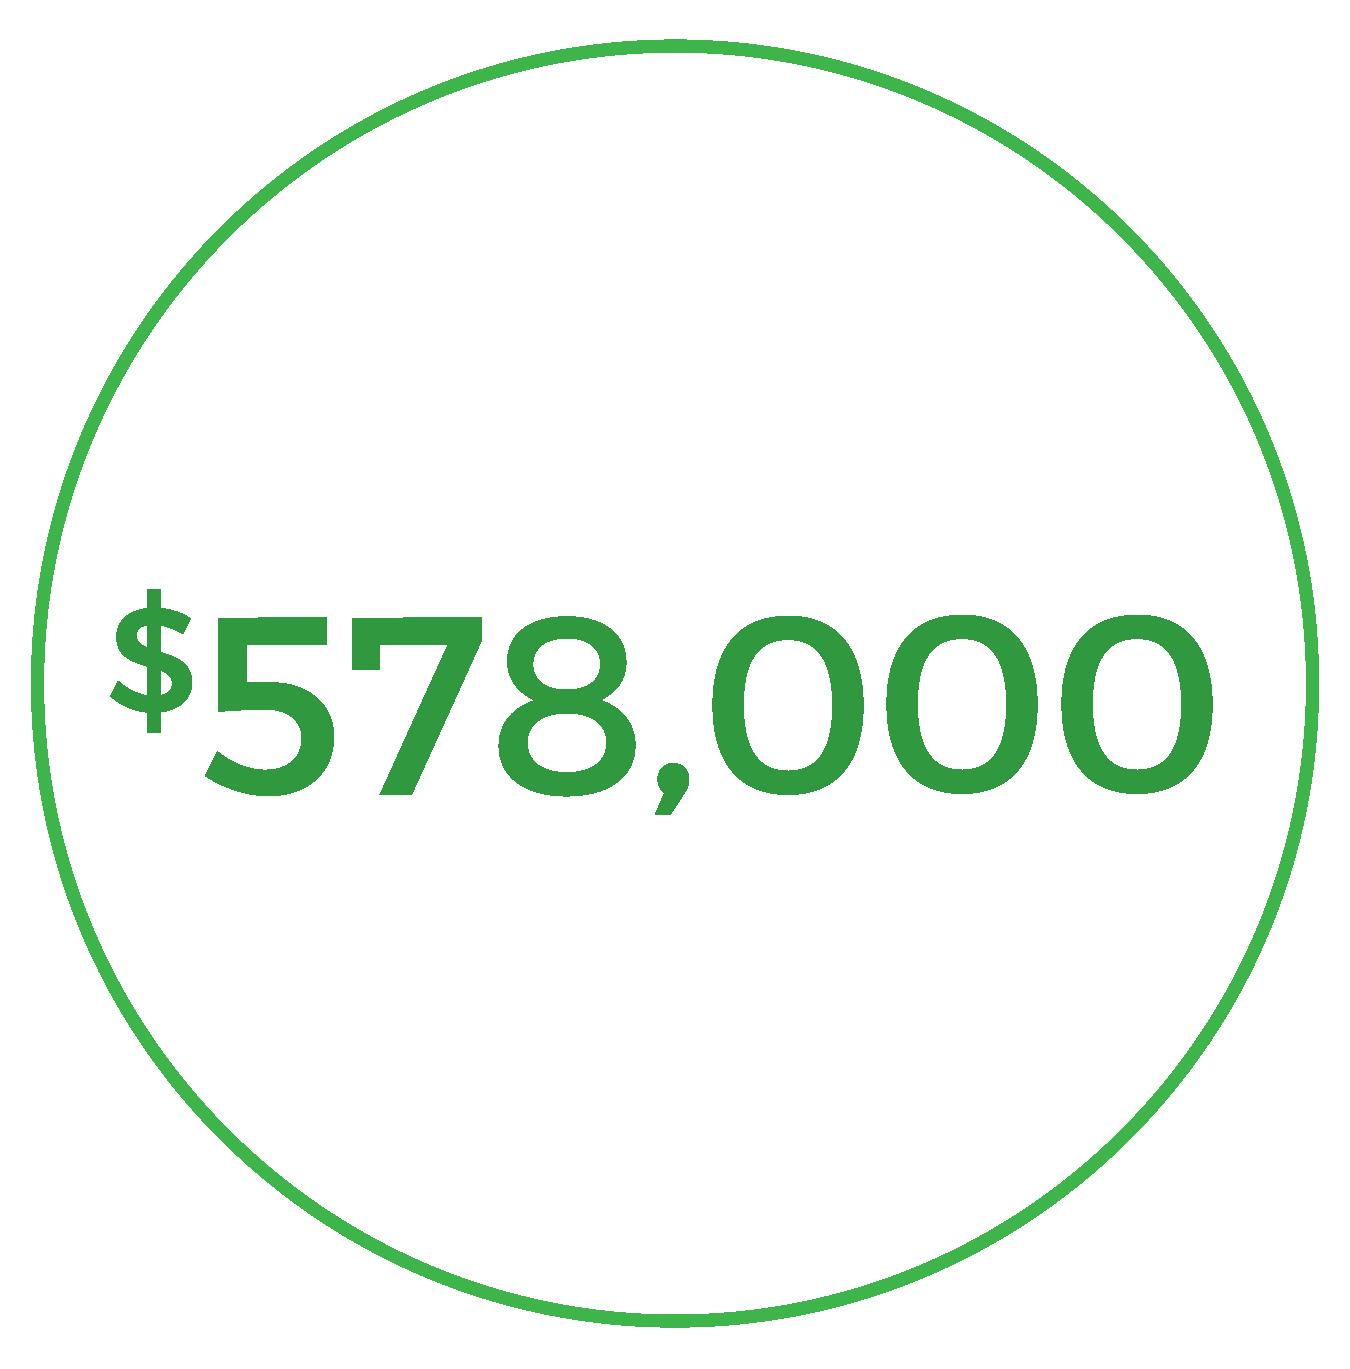 $578,000